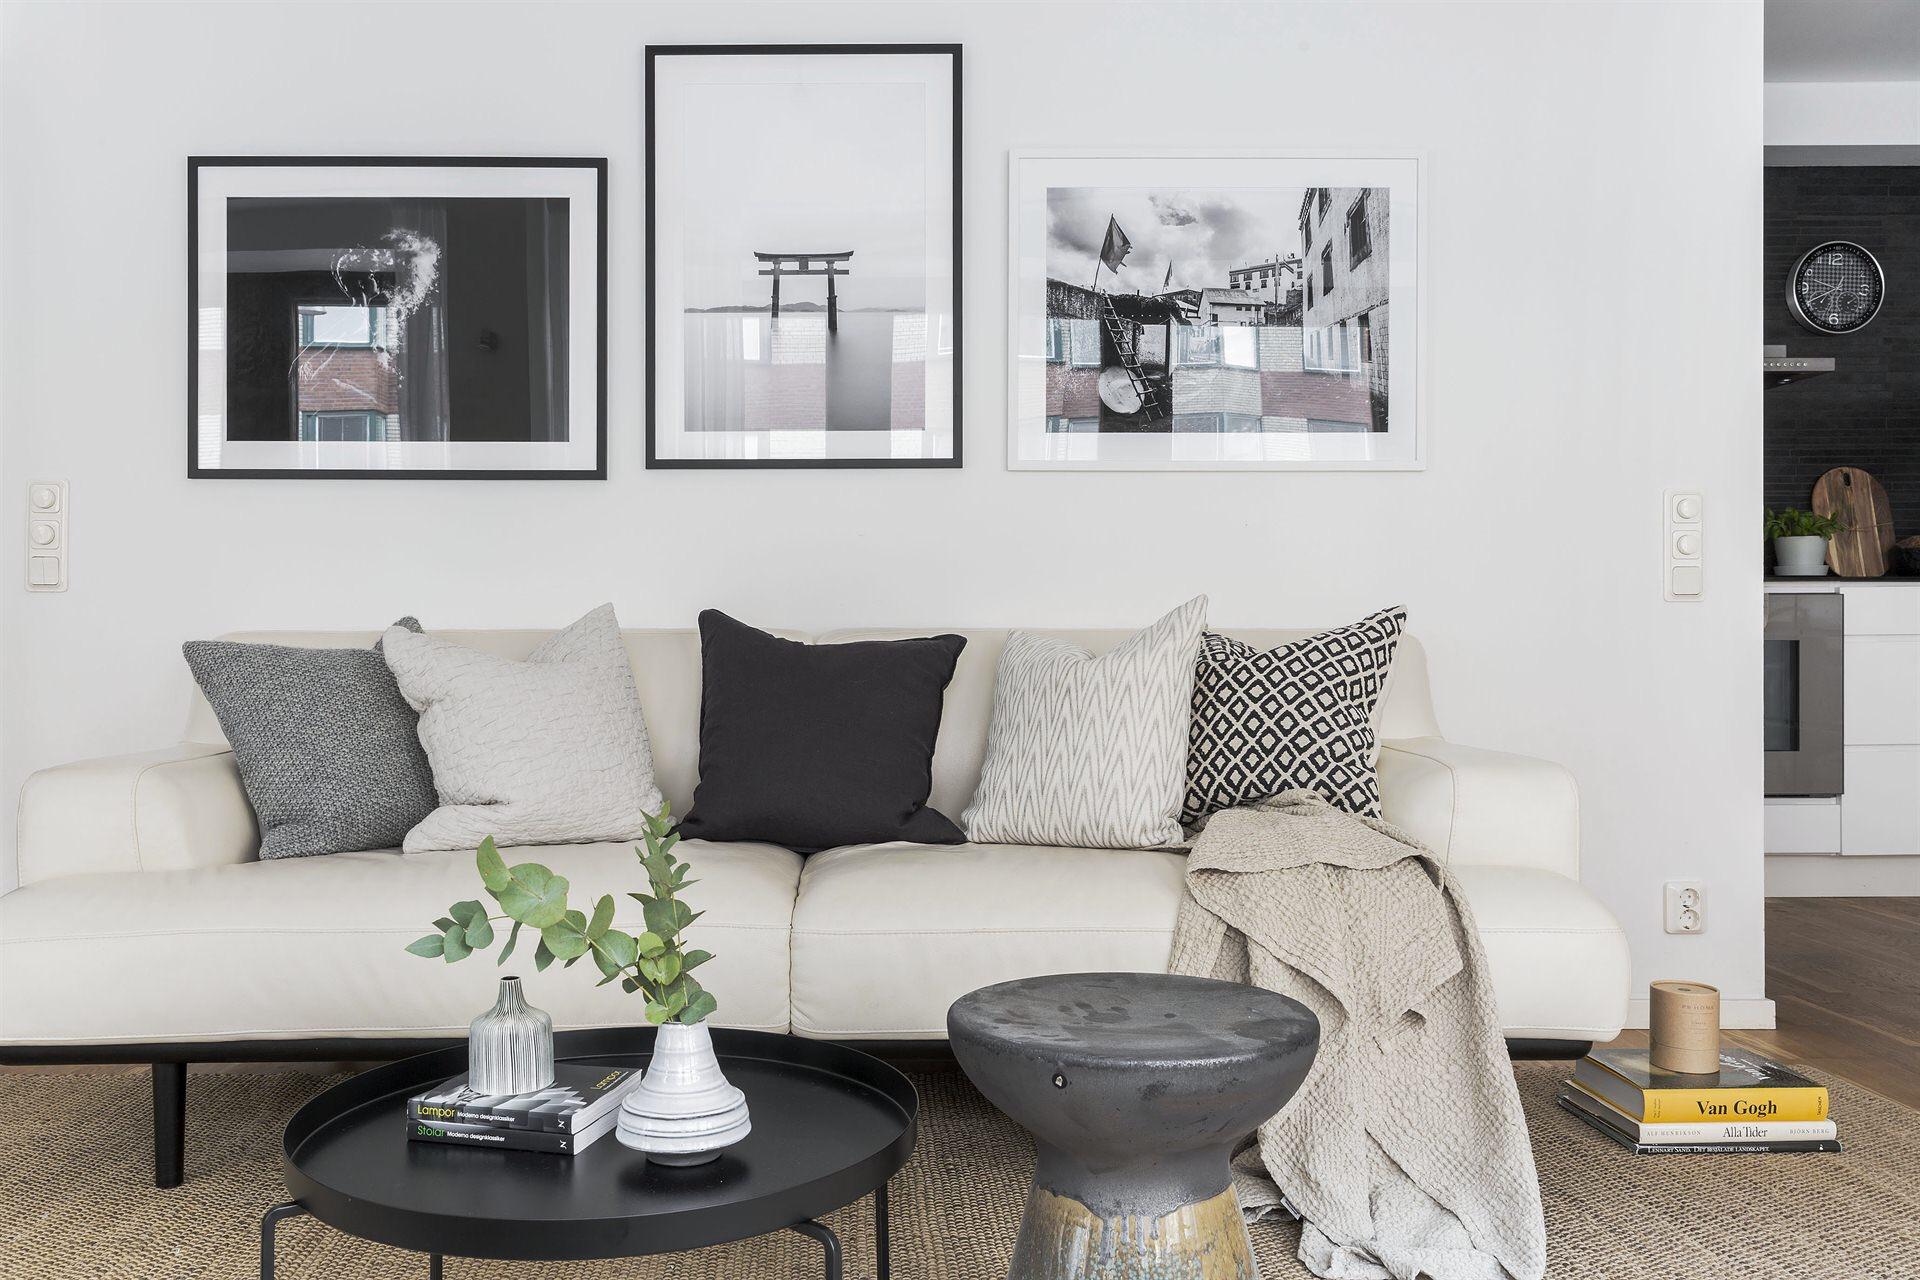 светлый диван подушки круглый столик табурет ковер циновка